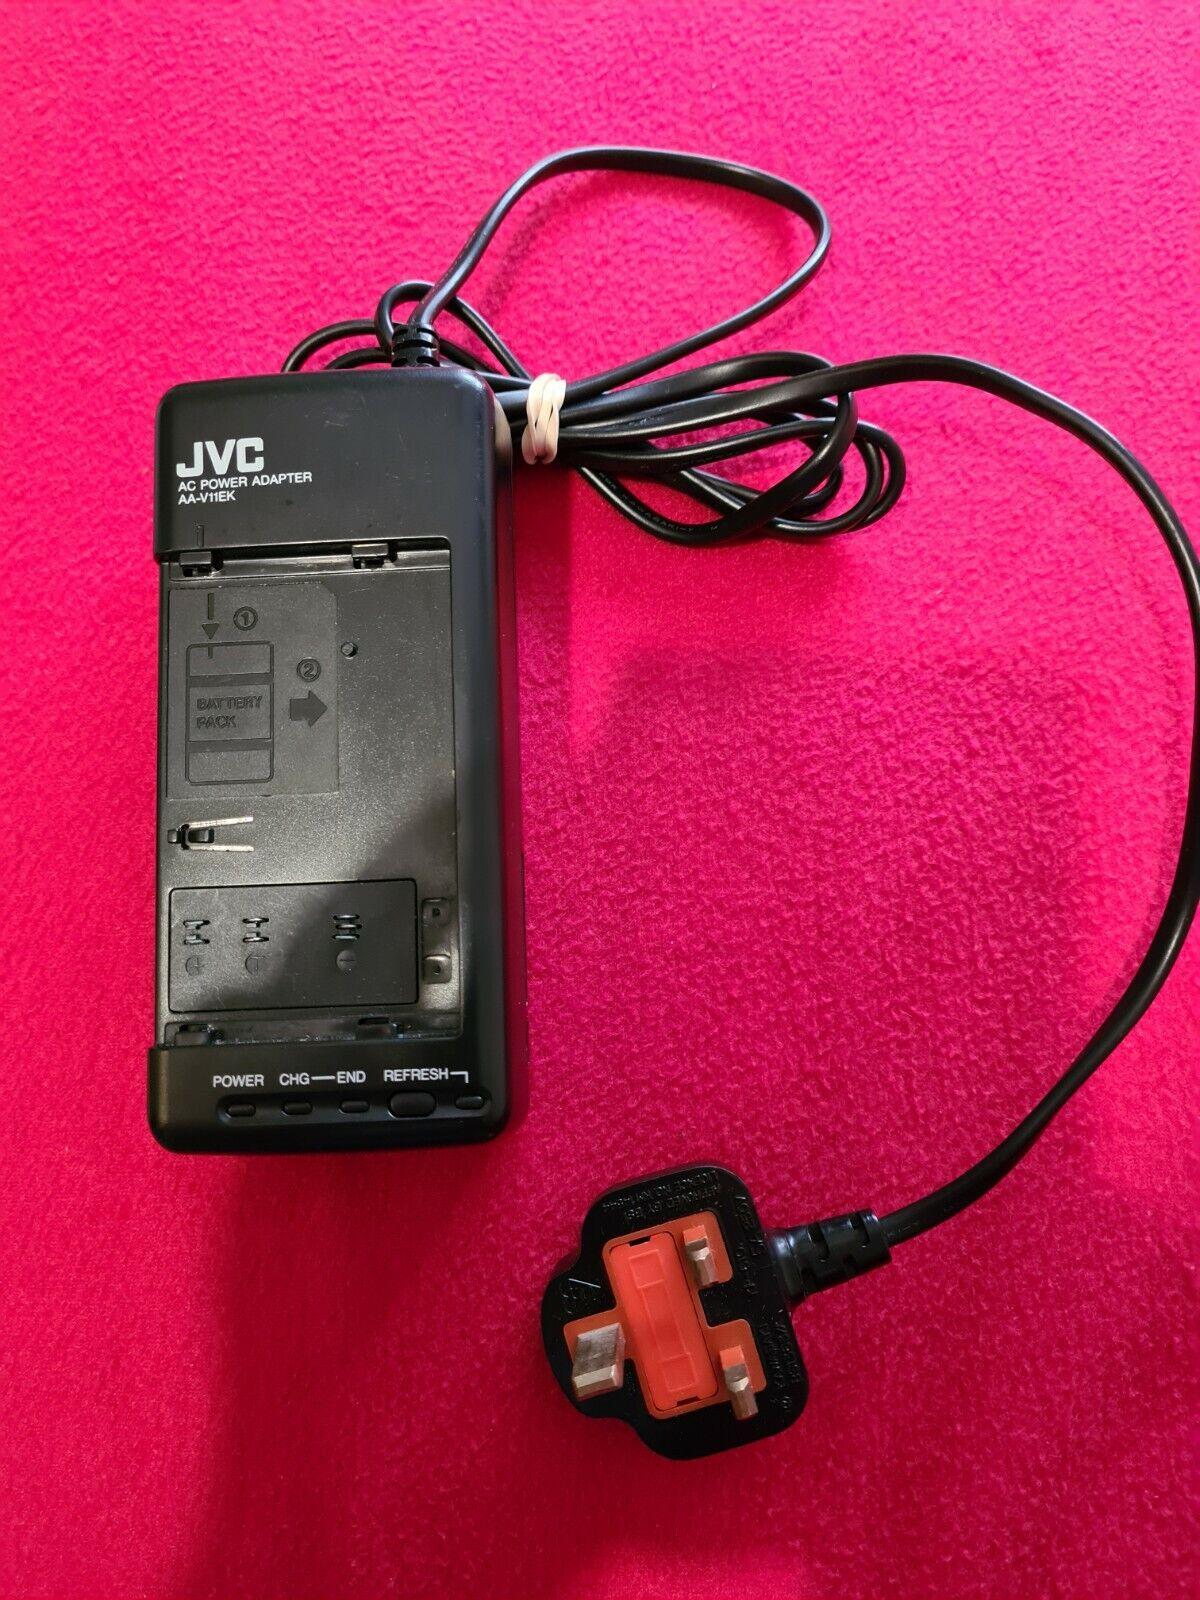 JVC AA-V11EK Camcorder Battery Charger AC Power Adaptor 8.5V